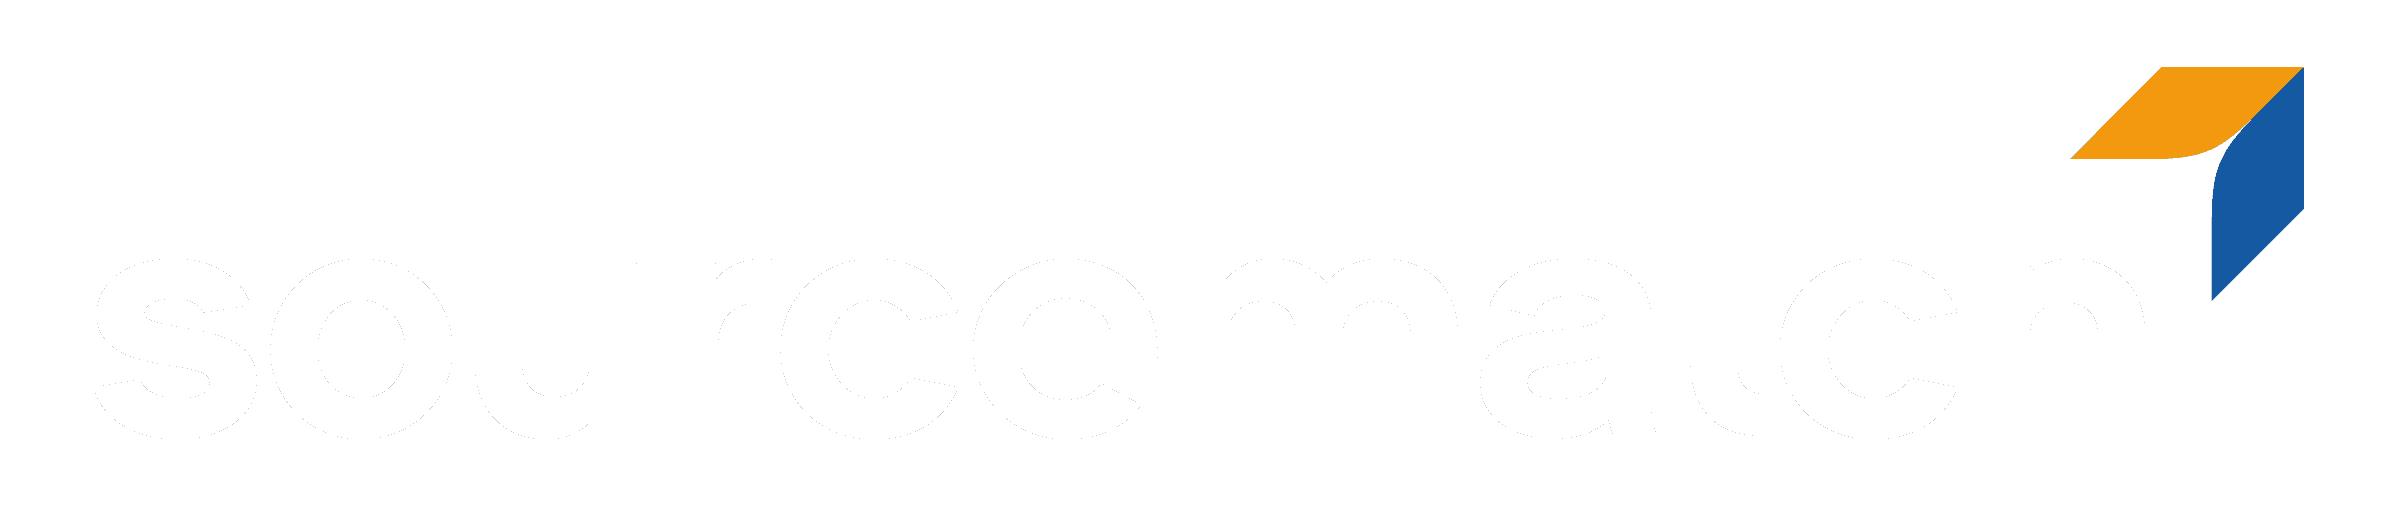 stark-team-logo